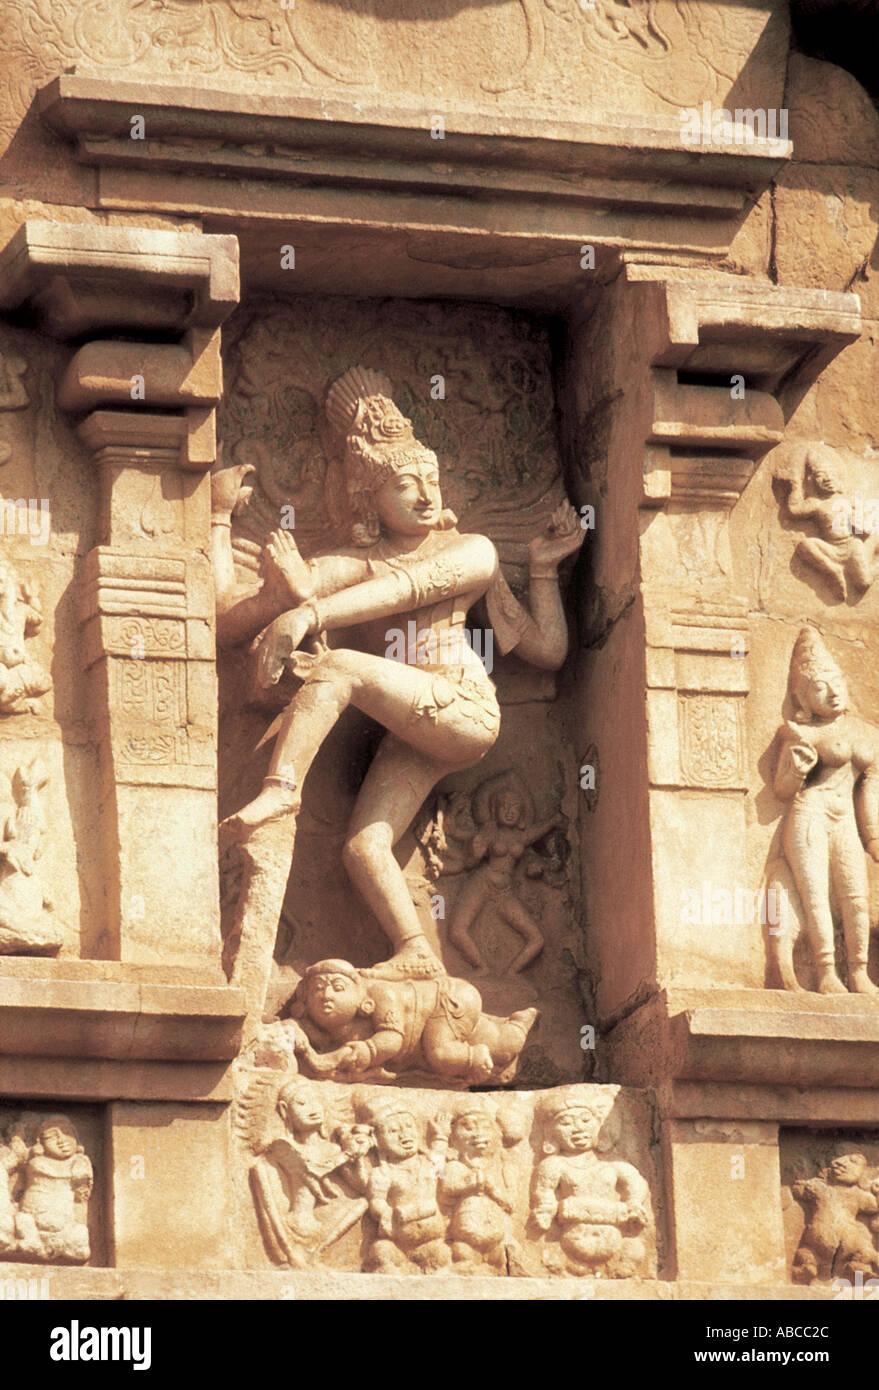 South wall of the Gangaikondacholapuram Erihadesvara Temple Shiva is depicted as Natraja Gangaikondacholapuram Tamilnadu India - Stock Image